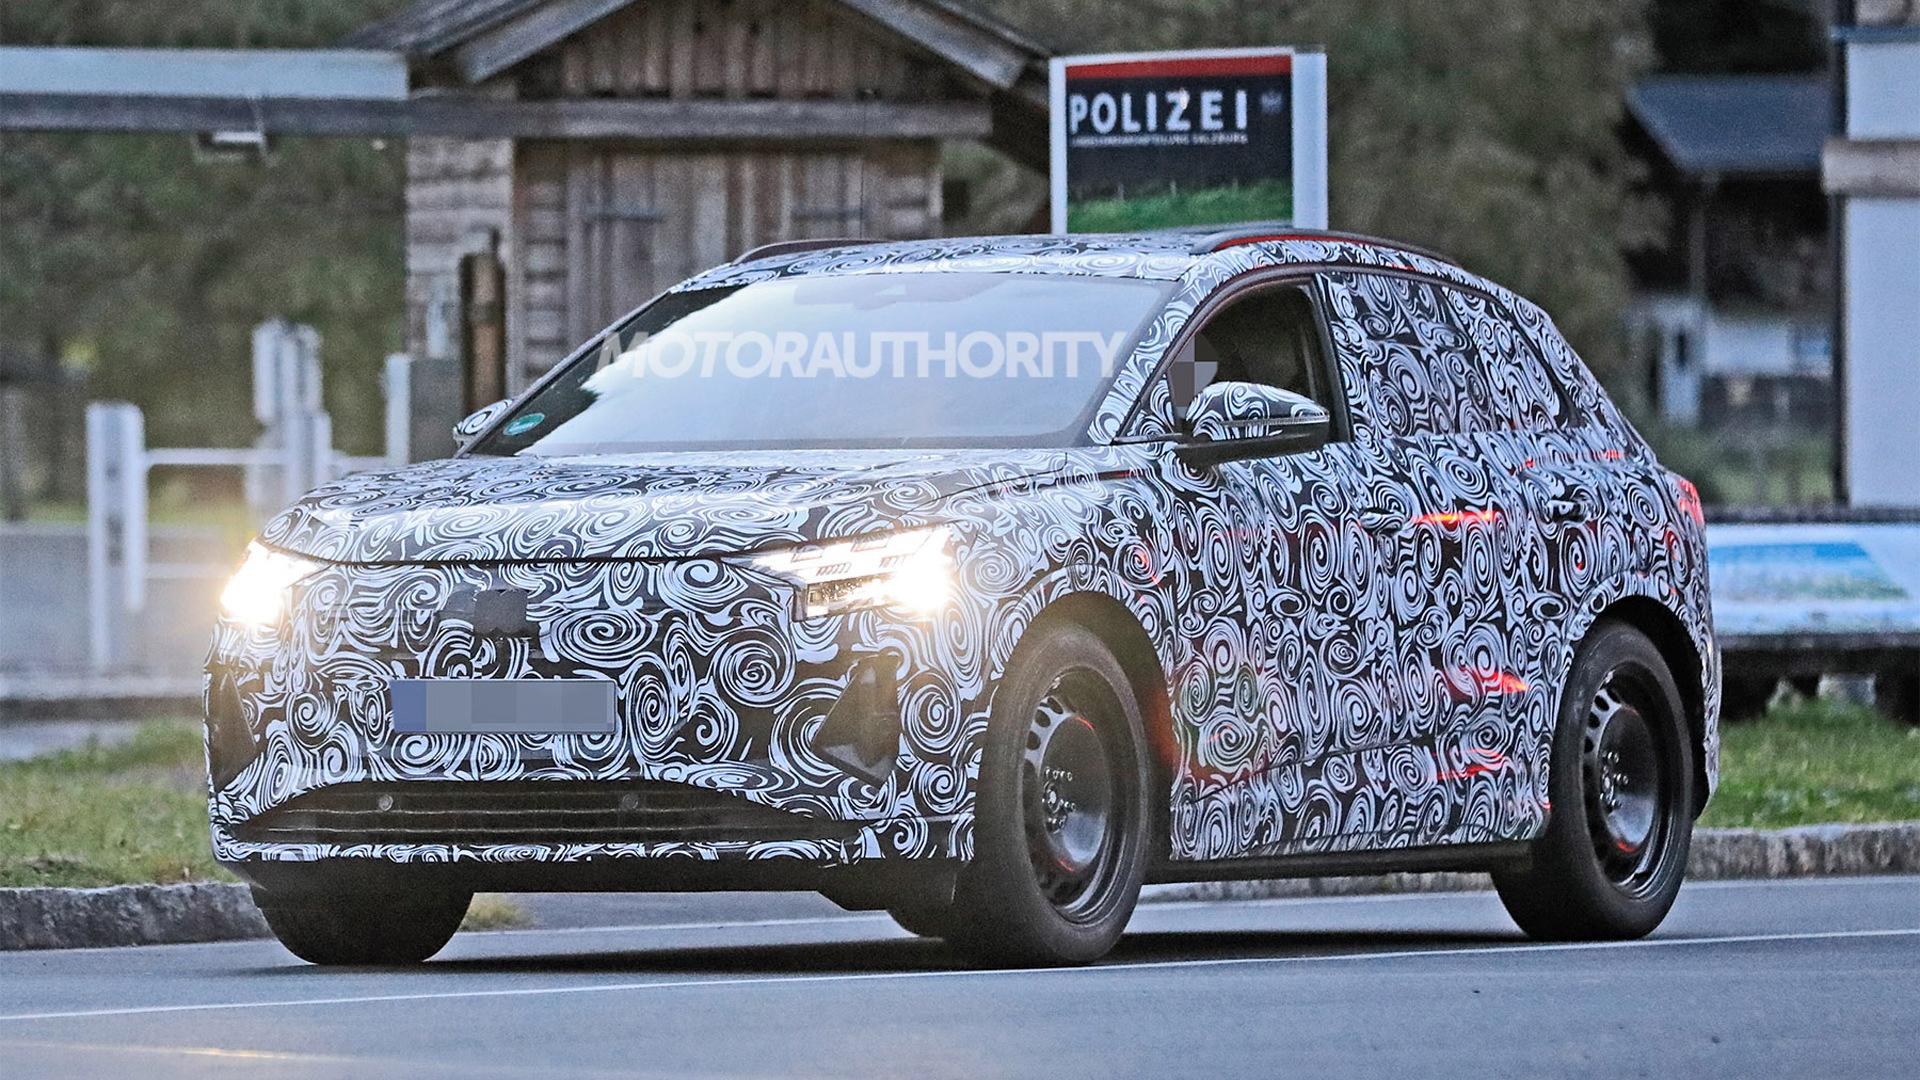 2022 Audi Q4 E-Tron spy shots - Photo credit:S. Baldauf/SB-Medien